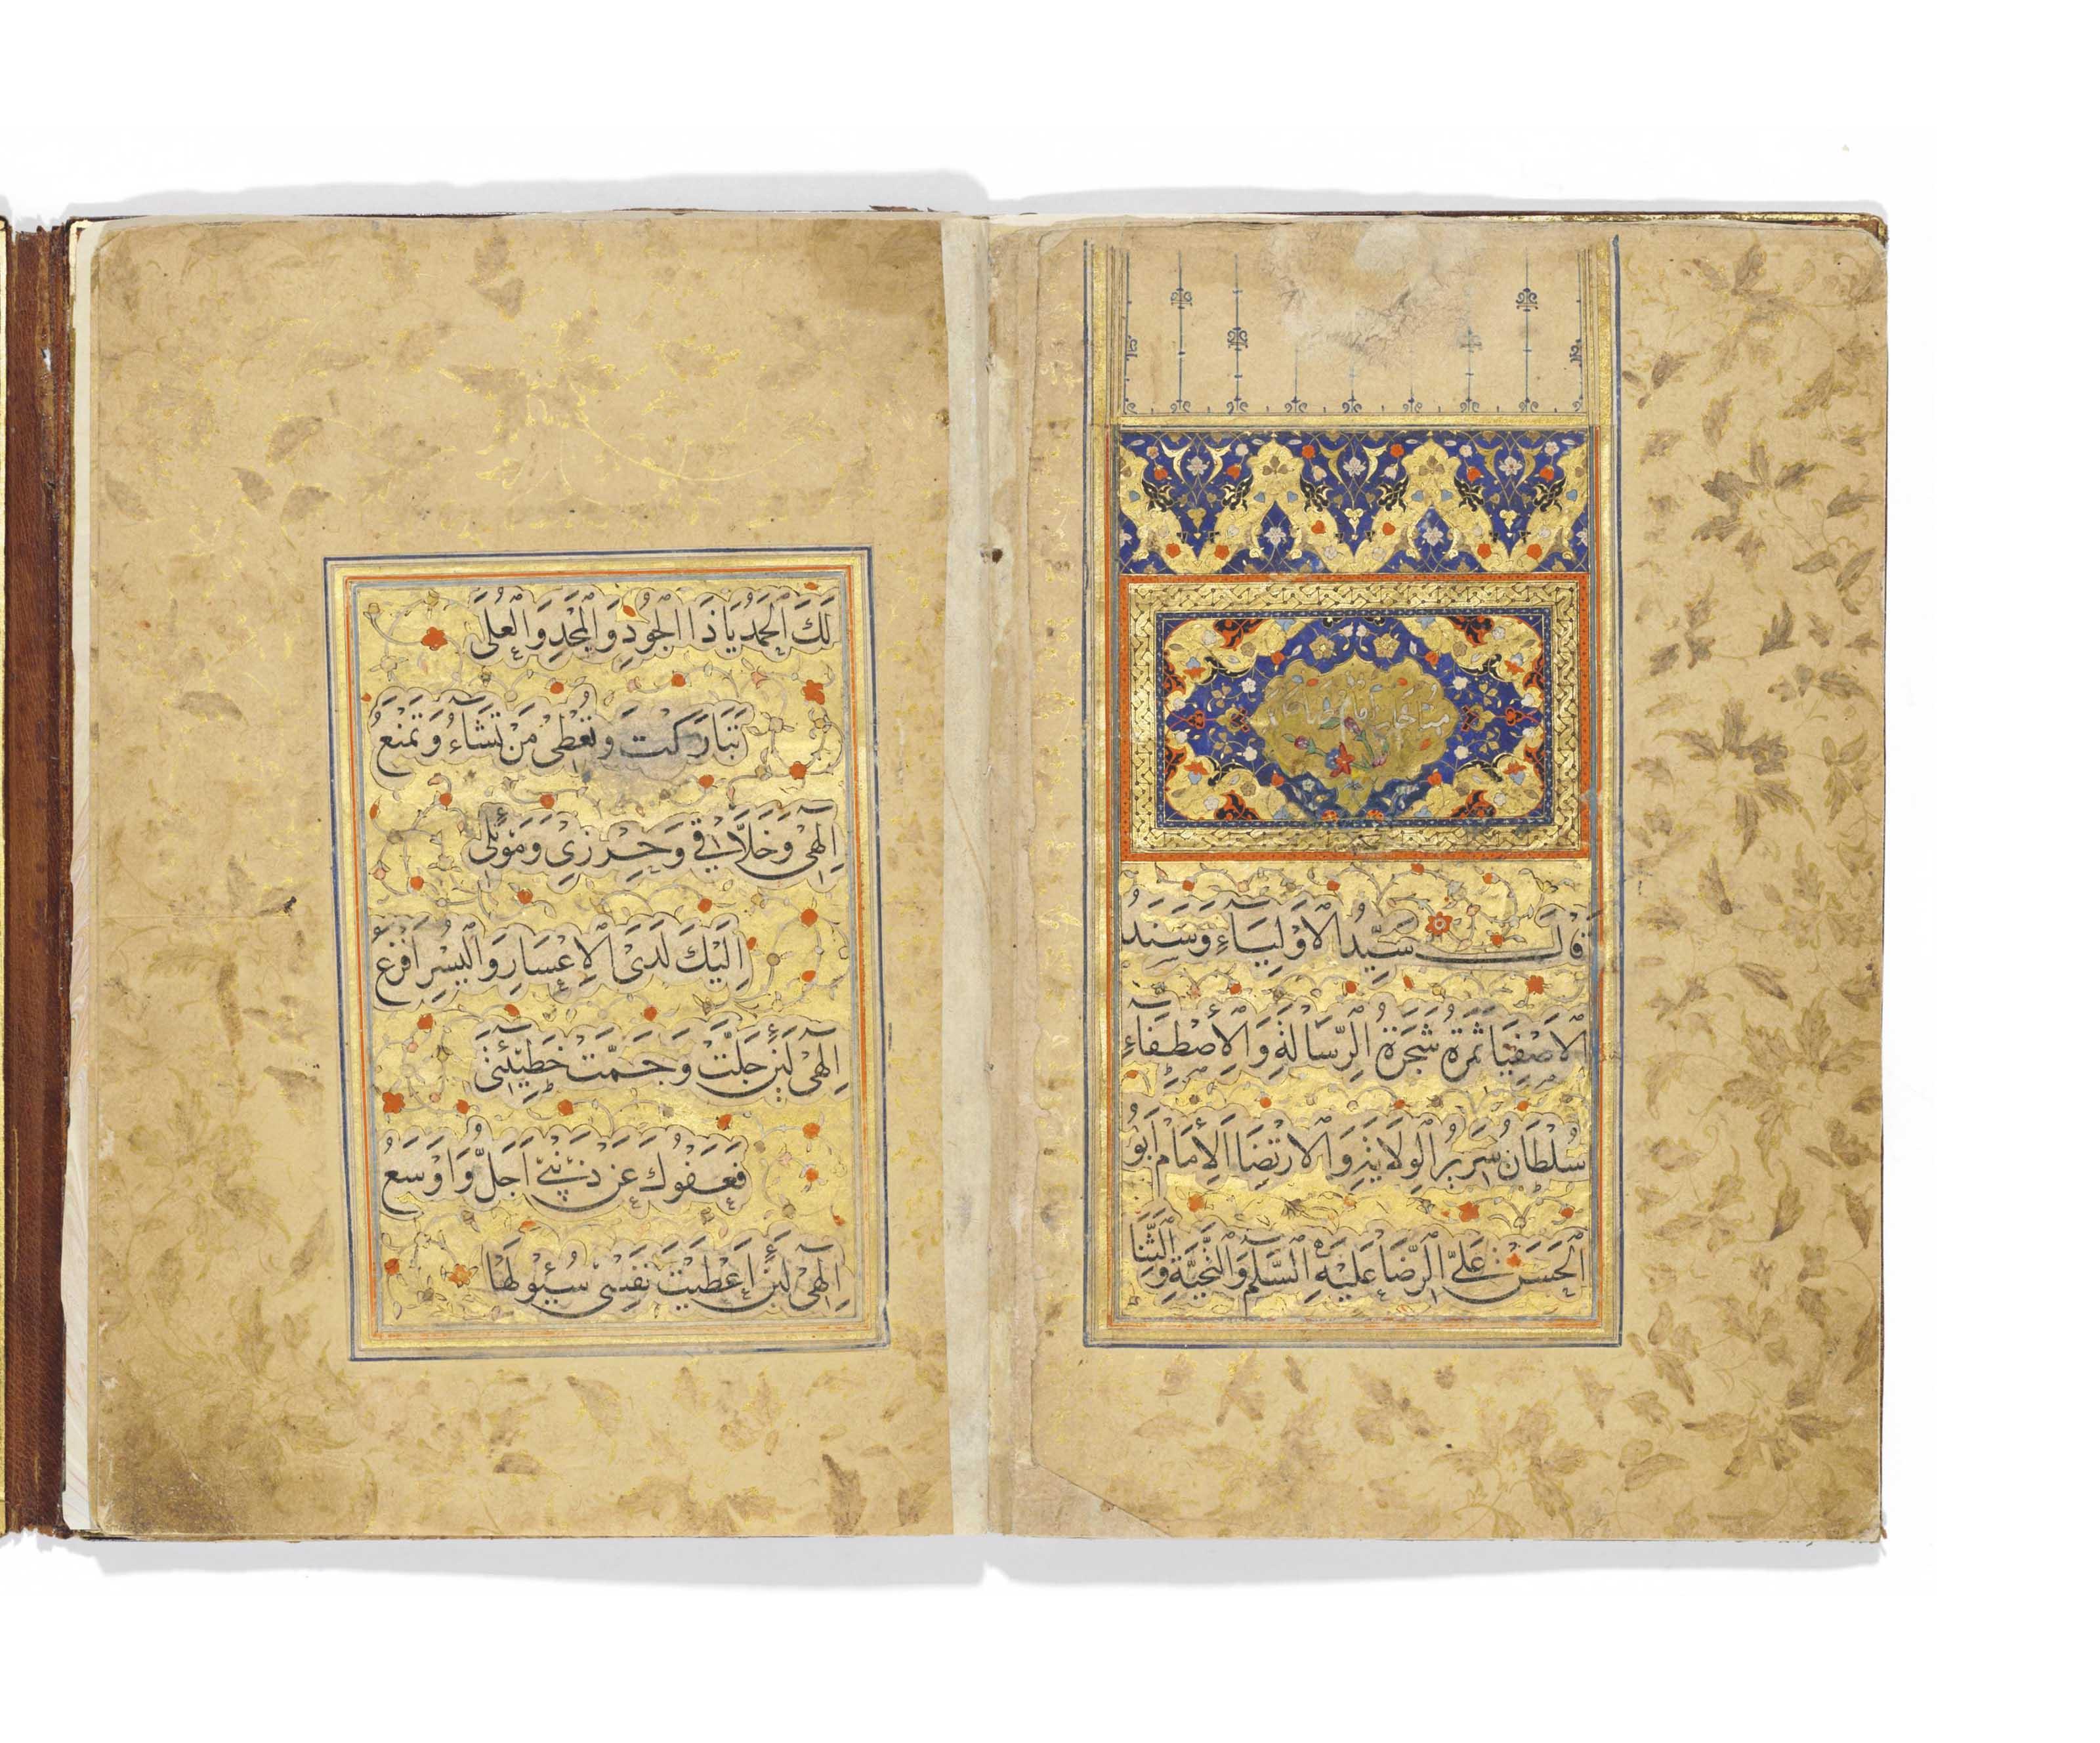 THE POEM (QASIDA) OF IMAM 'ALI